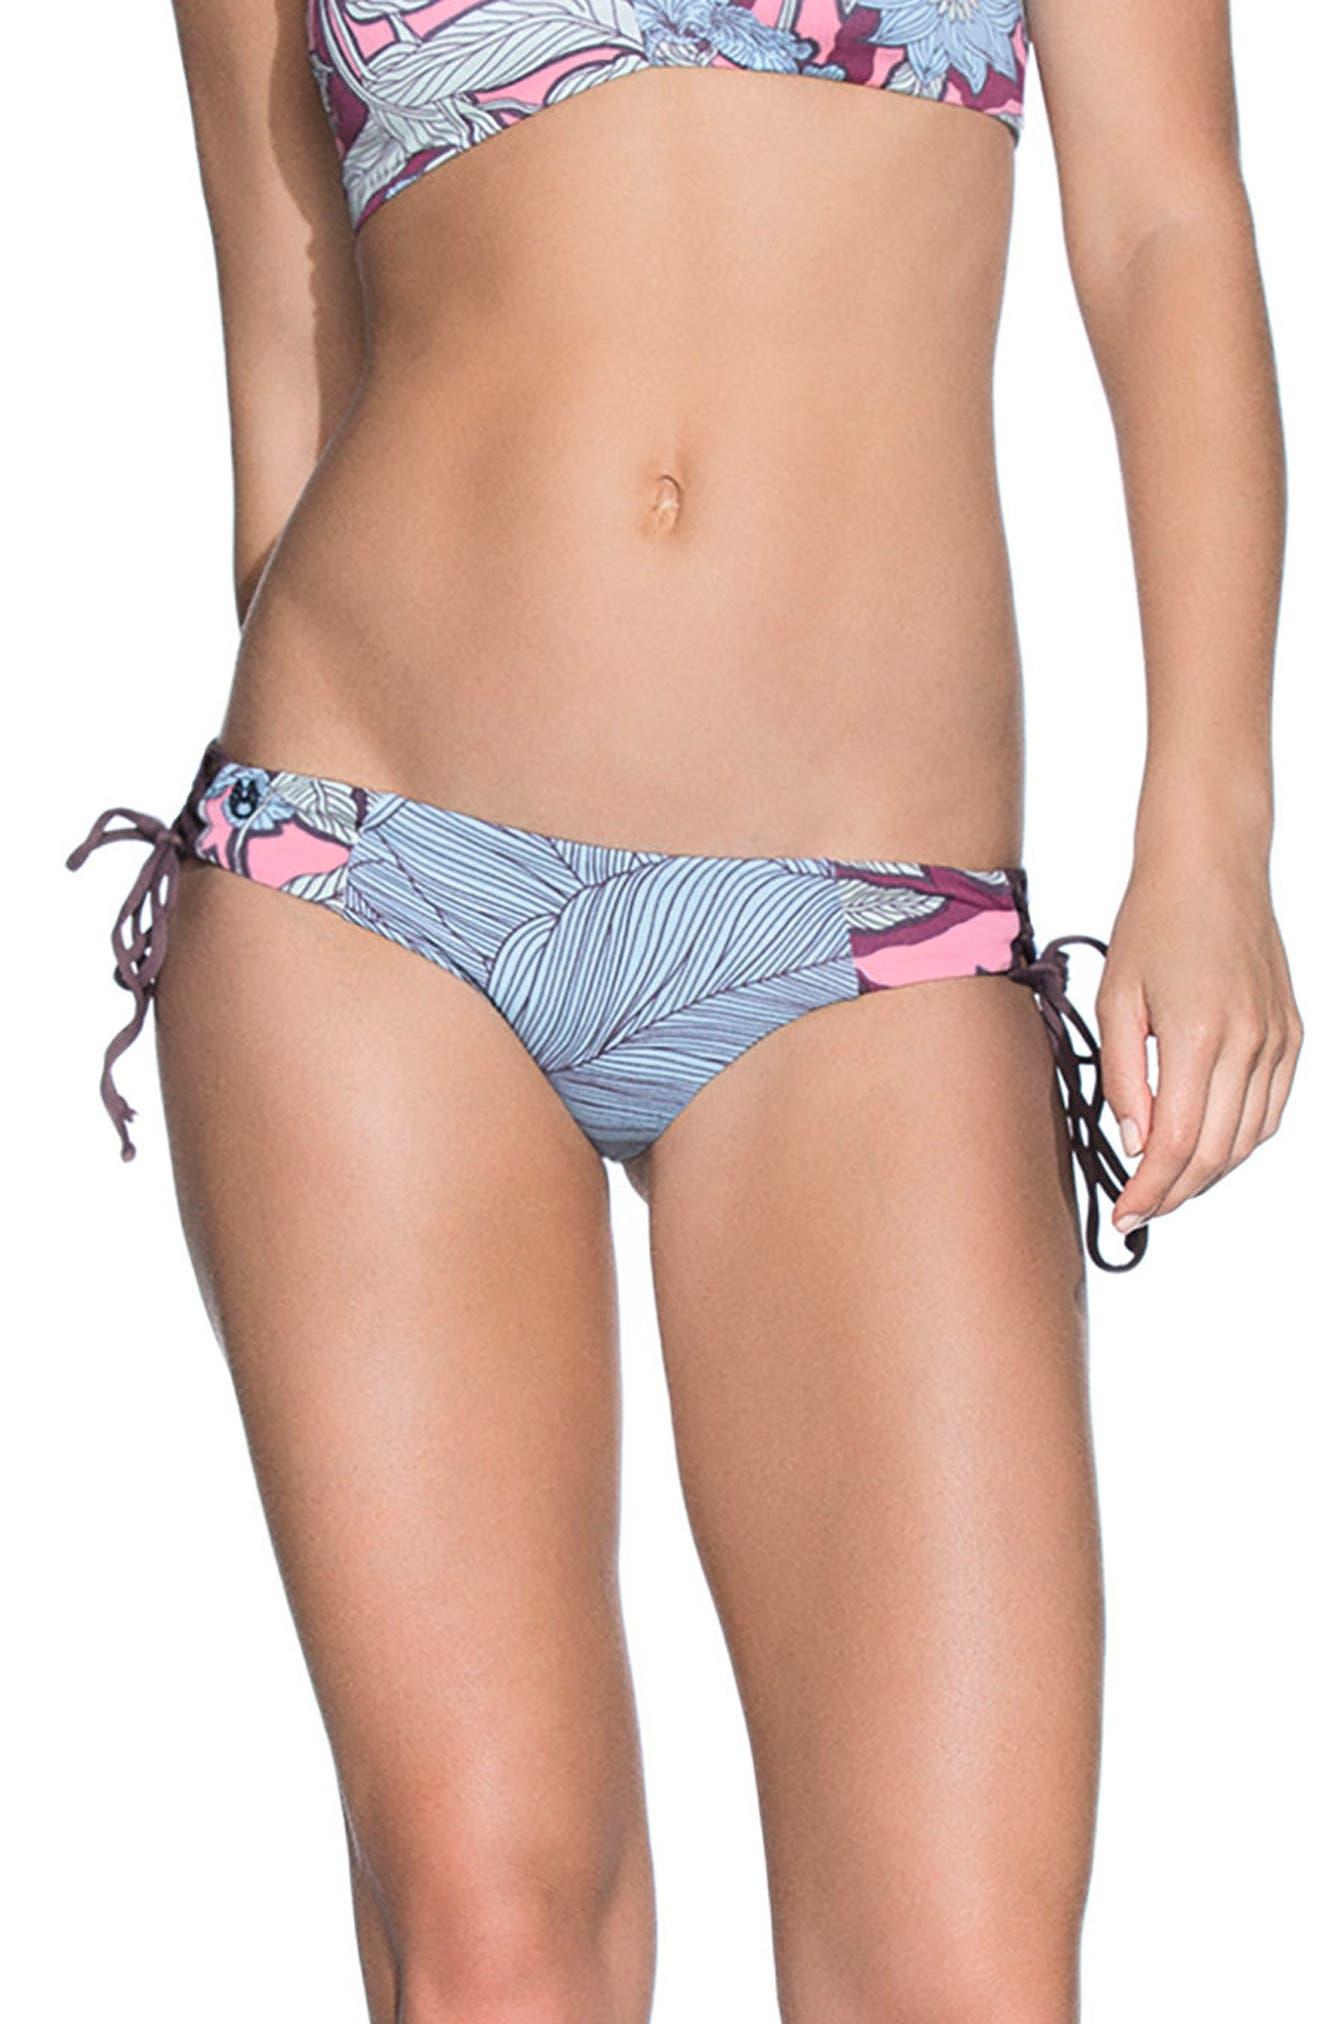 Providence Island Signature Rervsible Bikini Bottoms,                         Main,                         color, Light Blue Multi